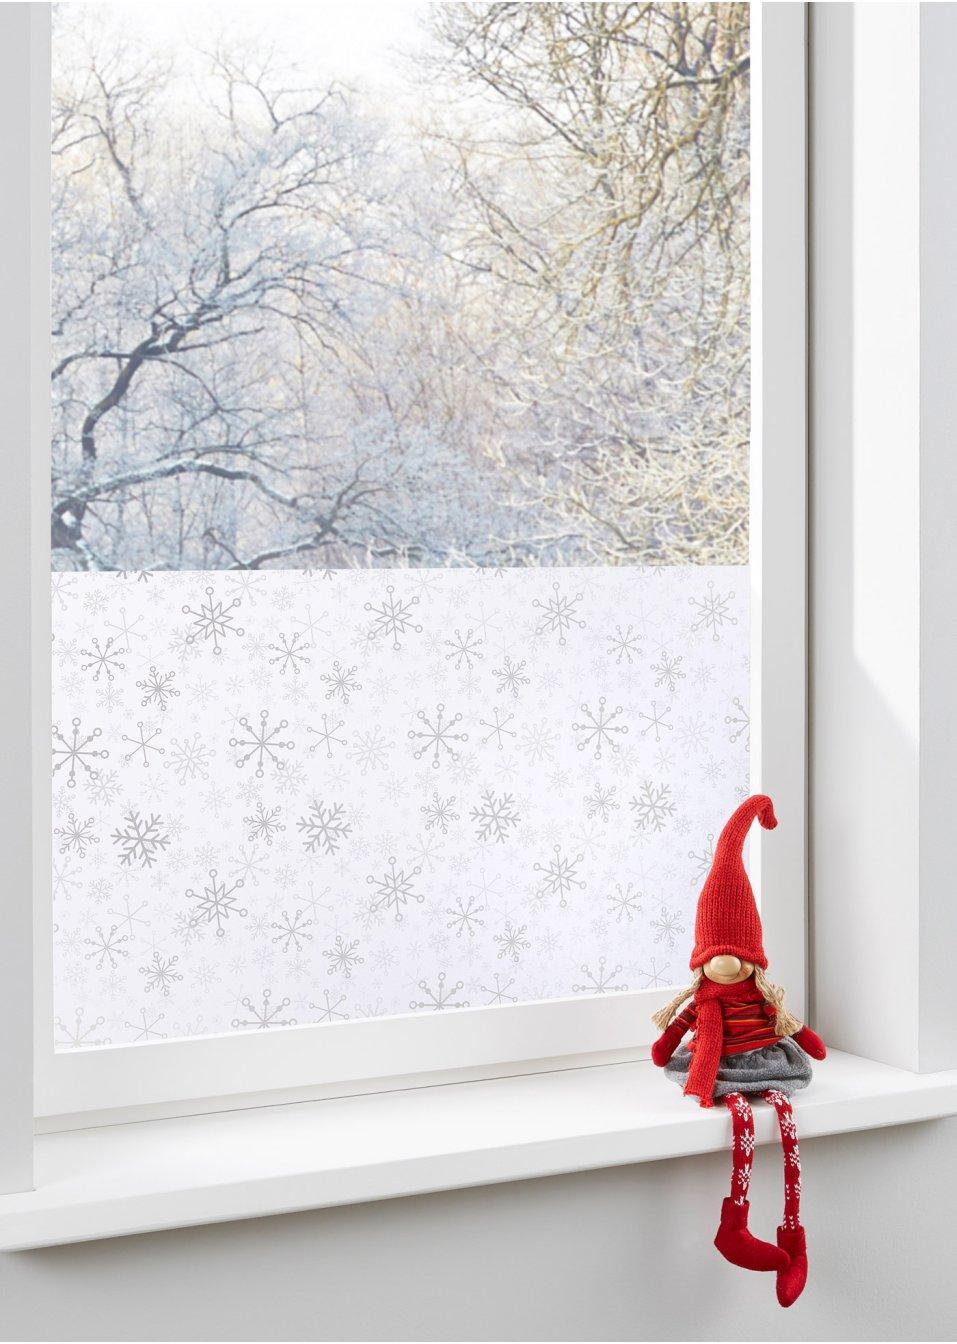 Parasguardi cristalli bianco grigio casa bpc - Bonprix catalogo casa ...